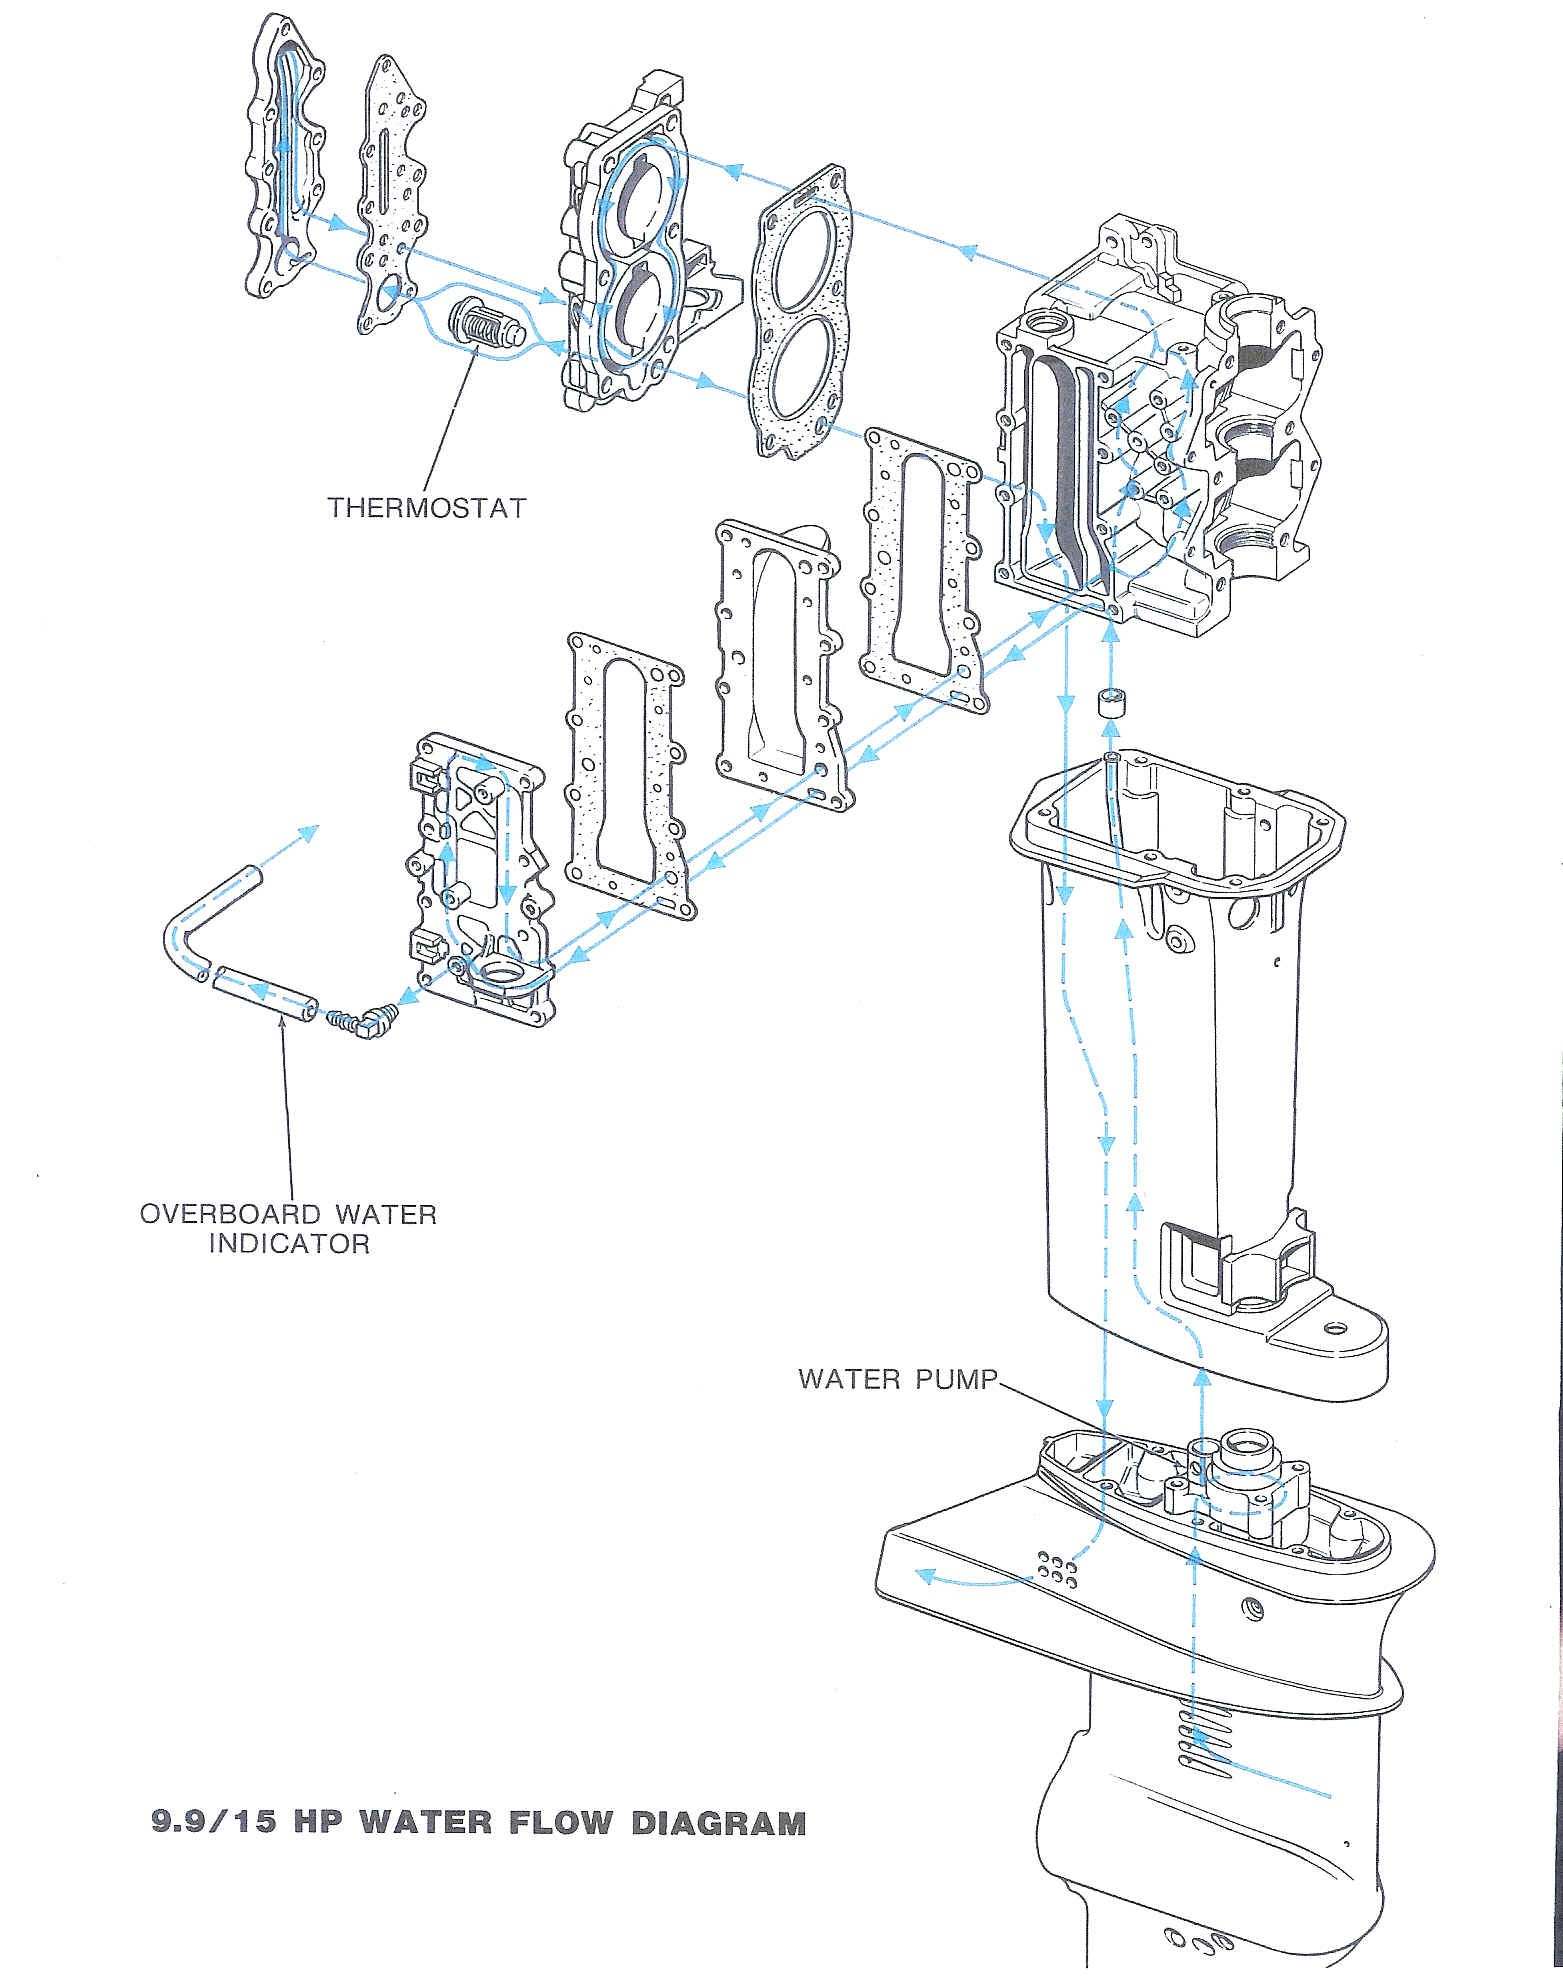 Two Stroke Engine Parts Diagram Maintaining Johnson Evinrude 9 9 Part 1